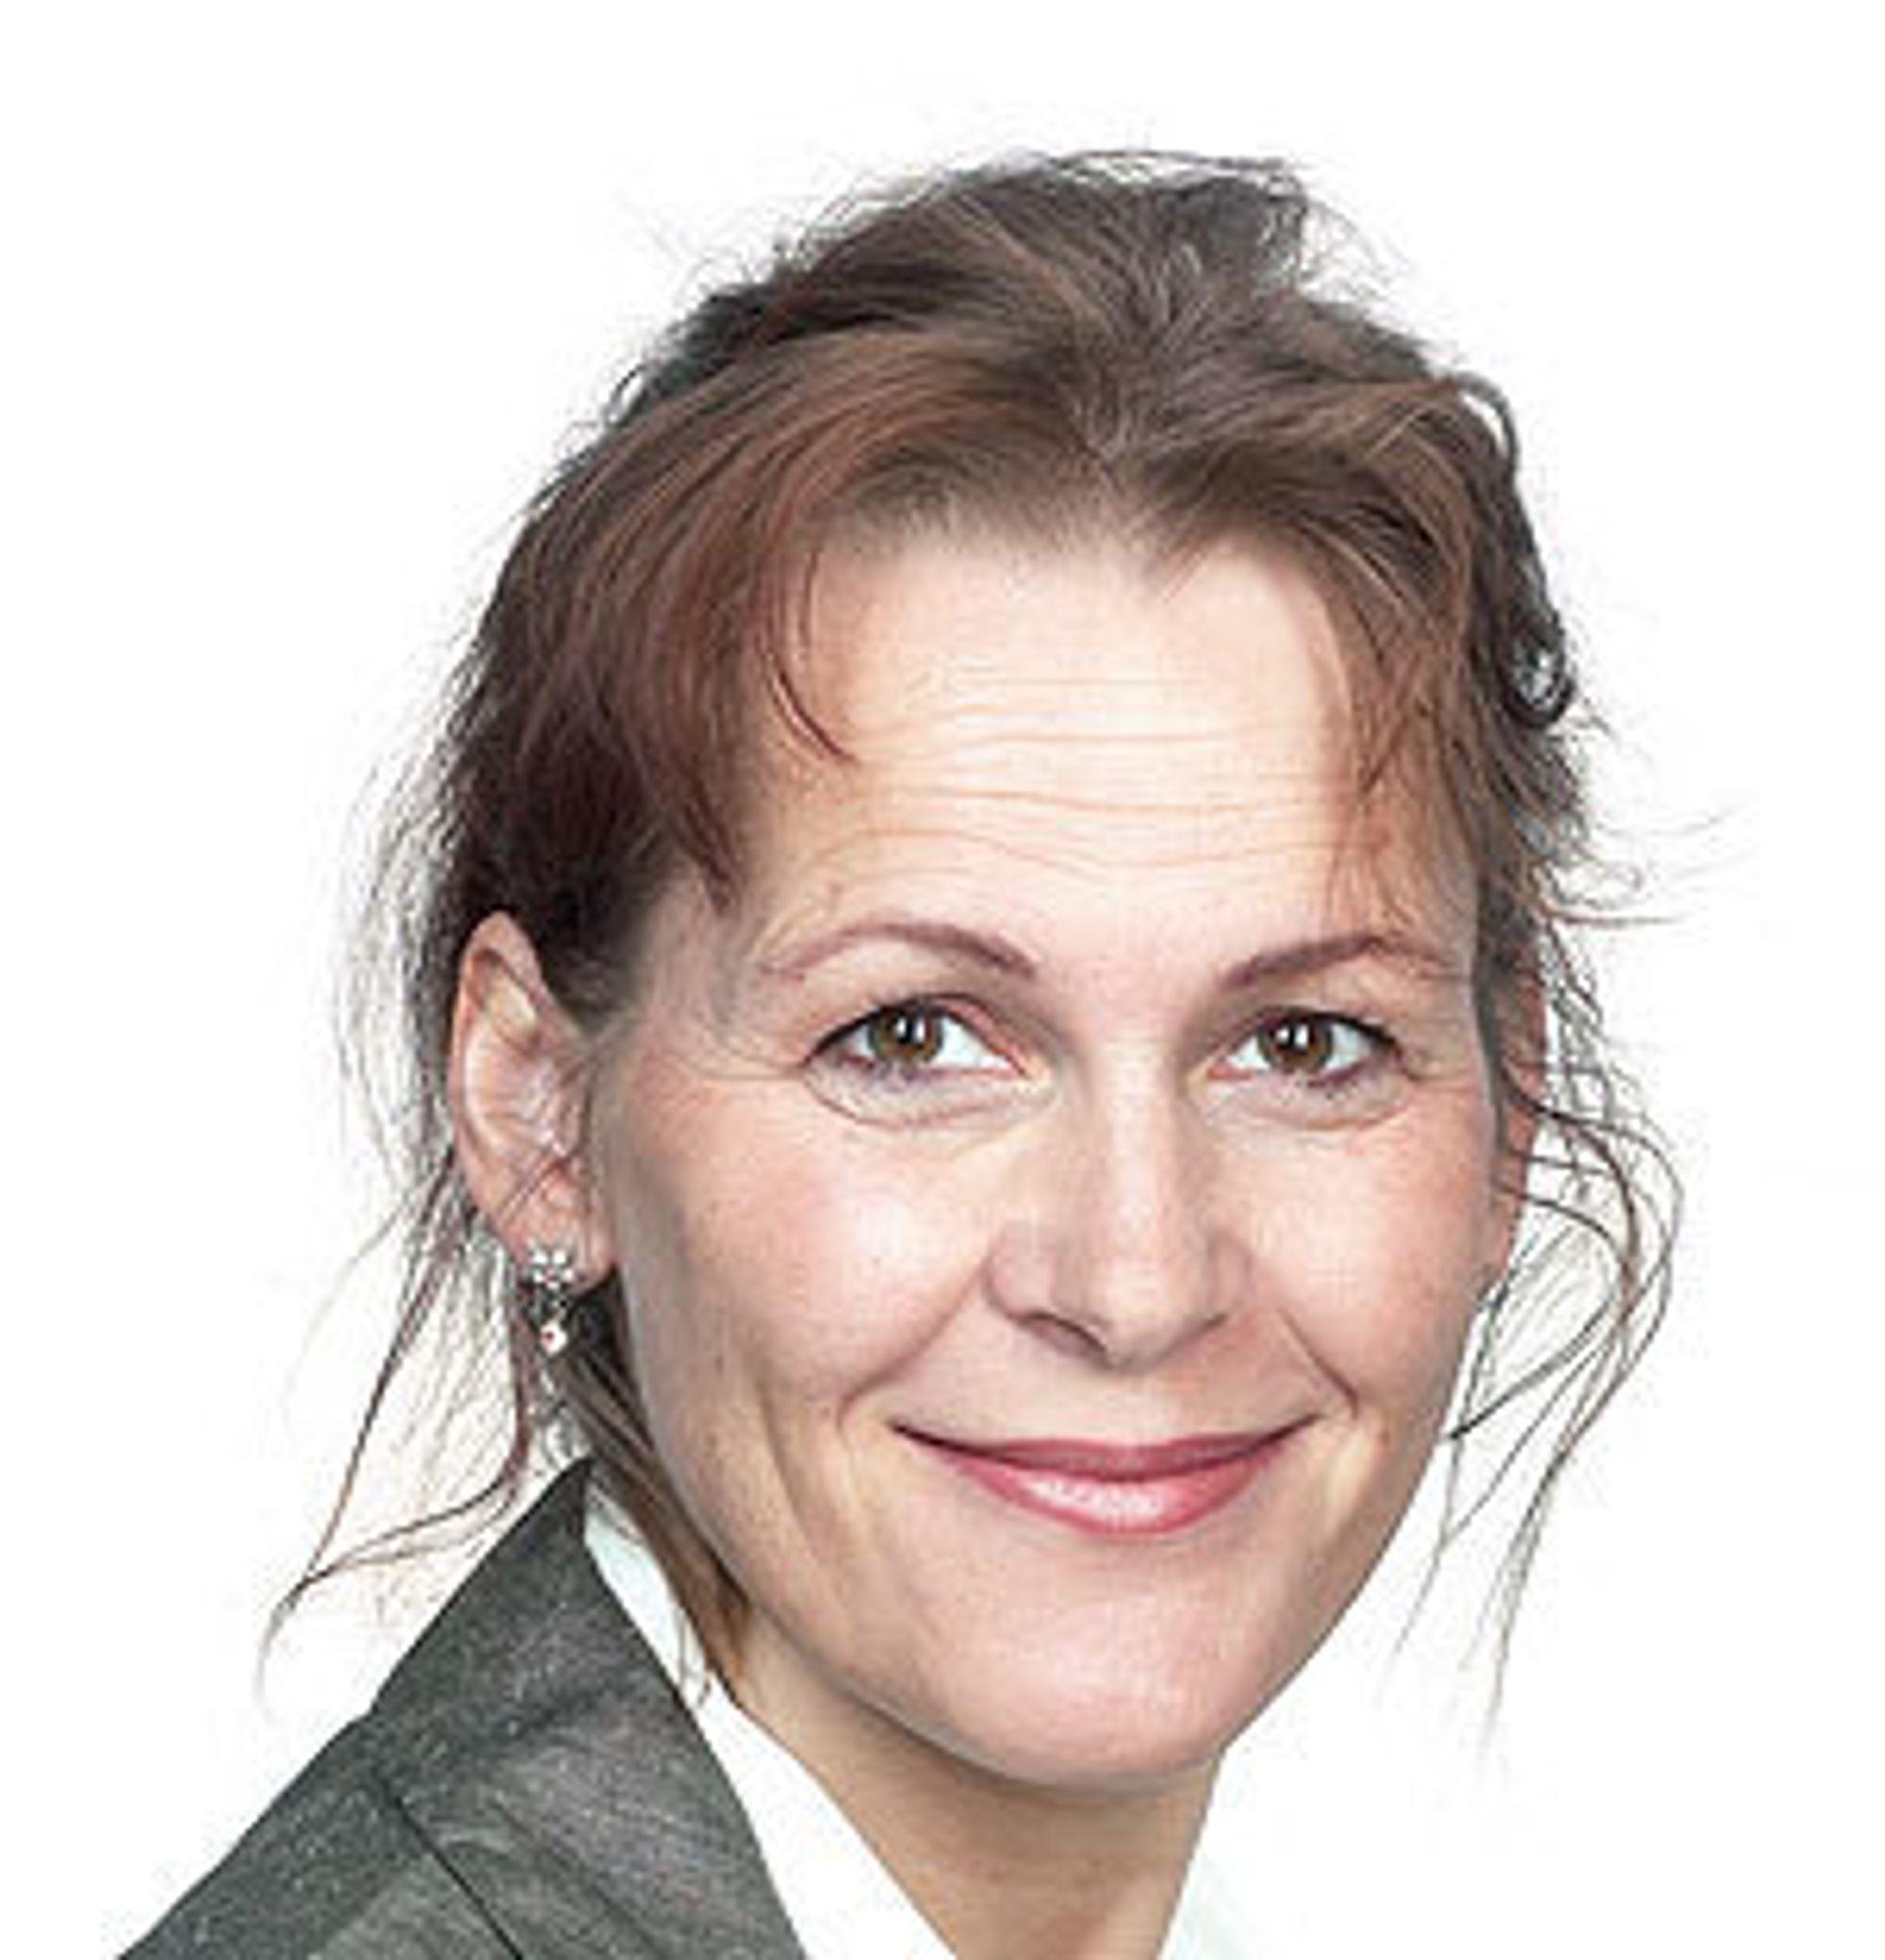 DYKTIG DAME: Sissel Helen Sare skal i følge Ole Morten Settevik være premissgiver for produktstrategien.